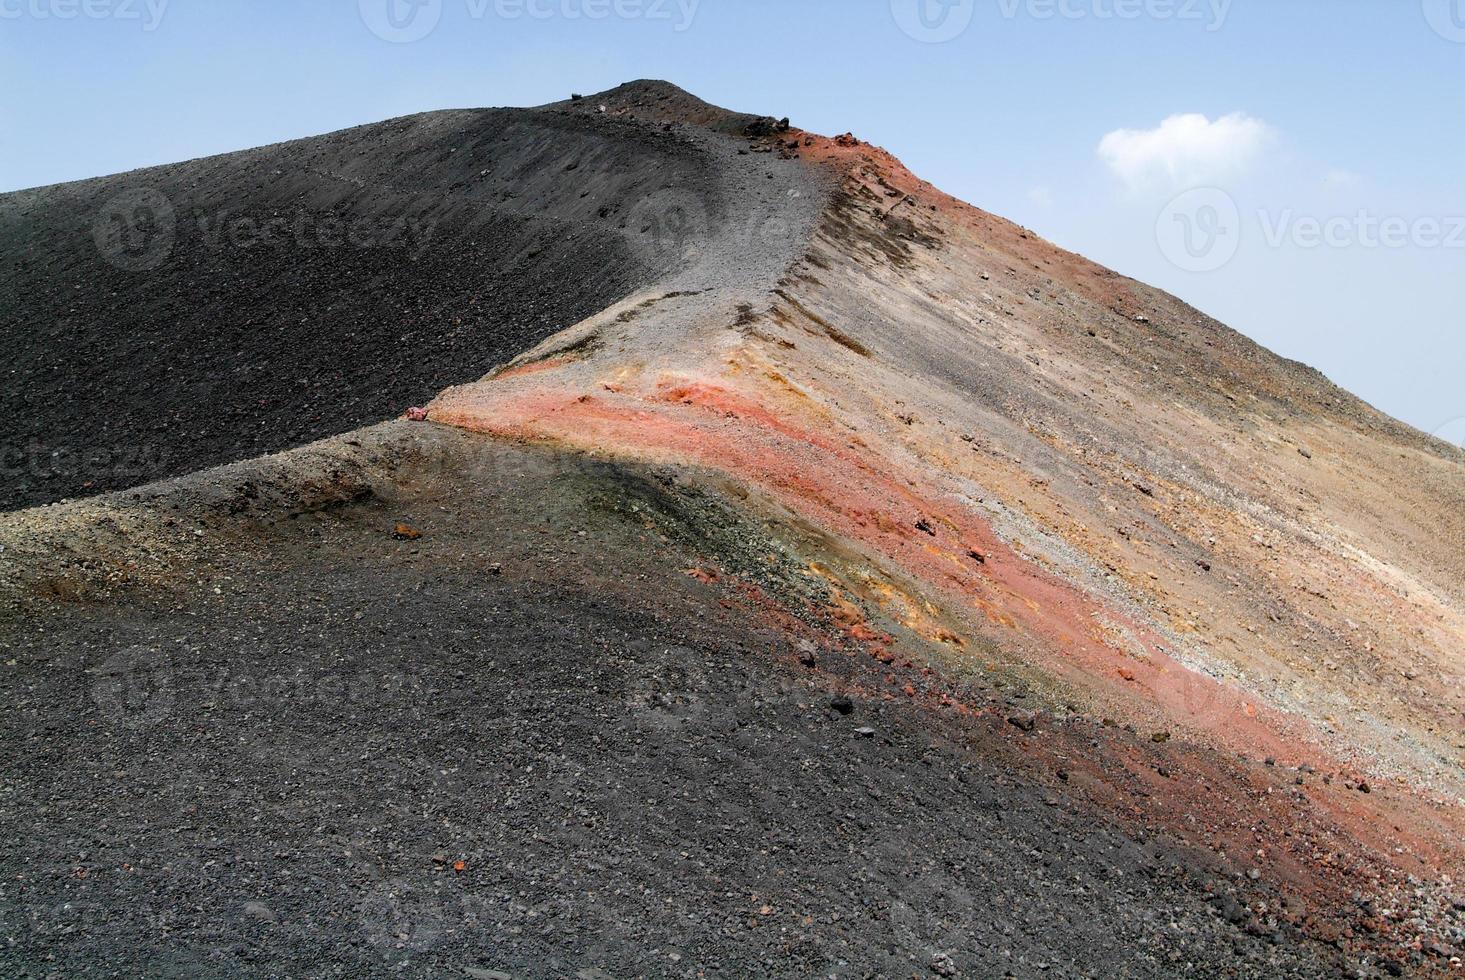 vulkaan van de Etna op Sicilië foto